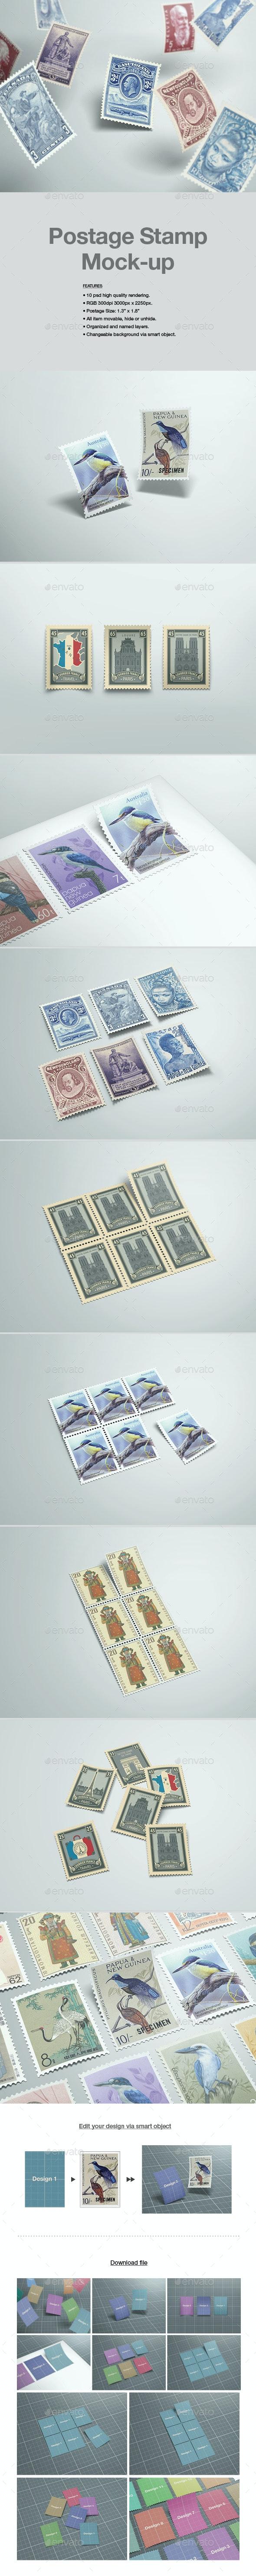 Postage Stamp Mock-up - Product Mock-Ups Graphics